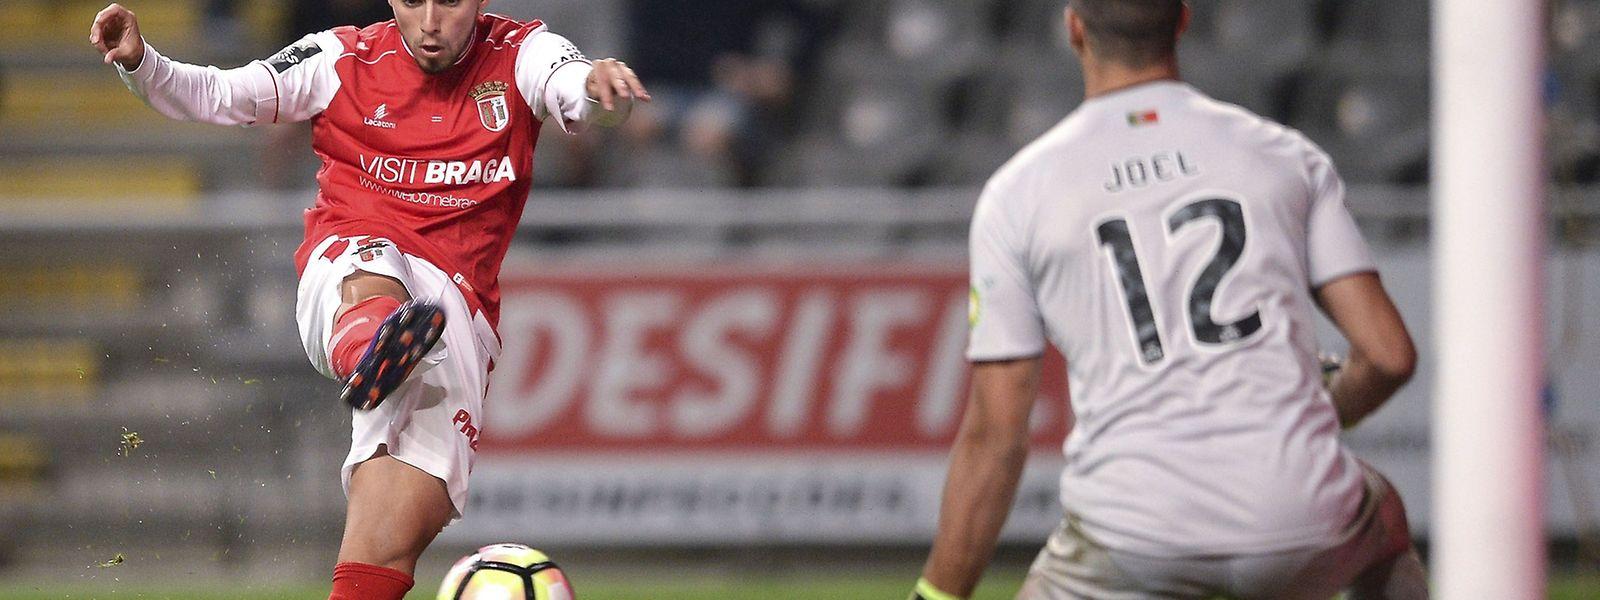 Ricardo Horta e o SC Braga querem vencer o Feirense para chegar ao terceiro lugar